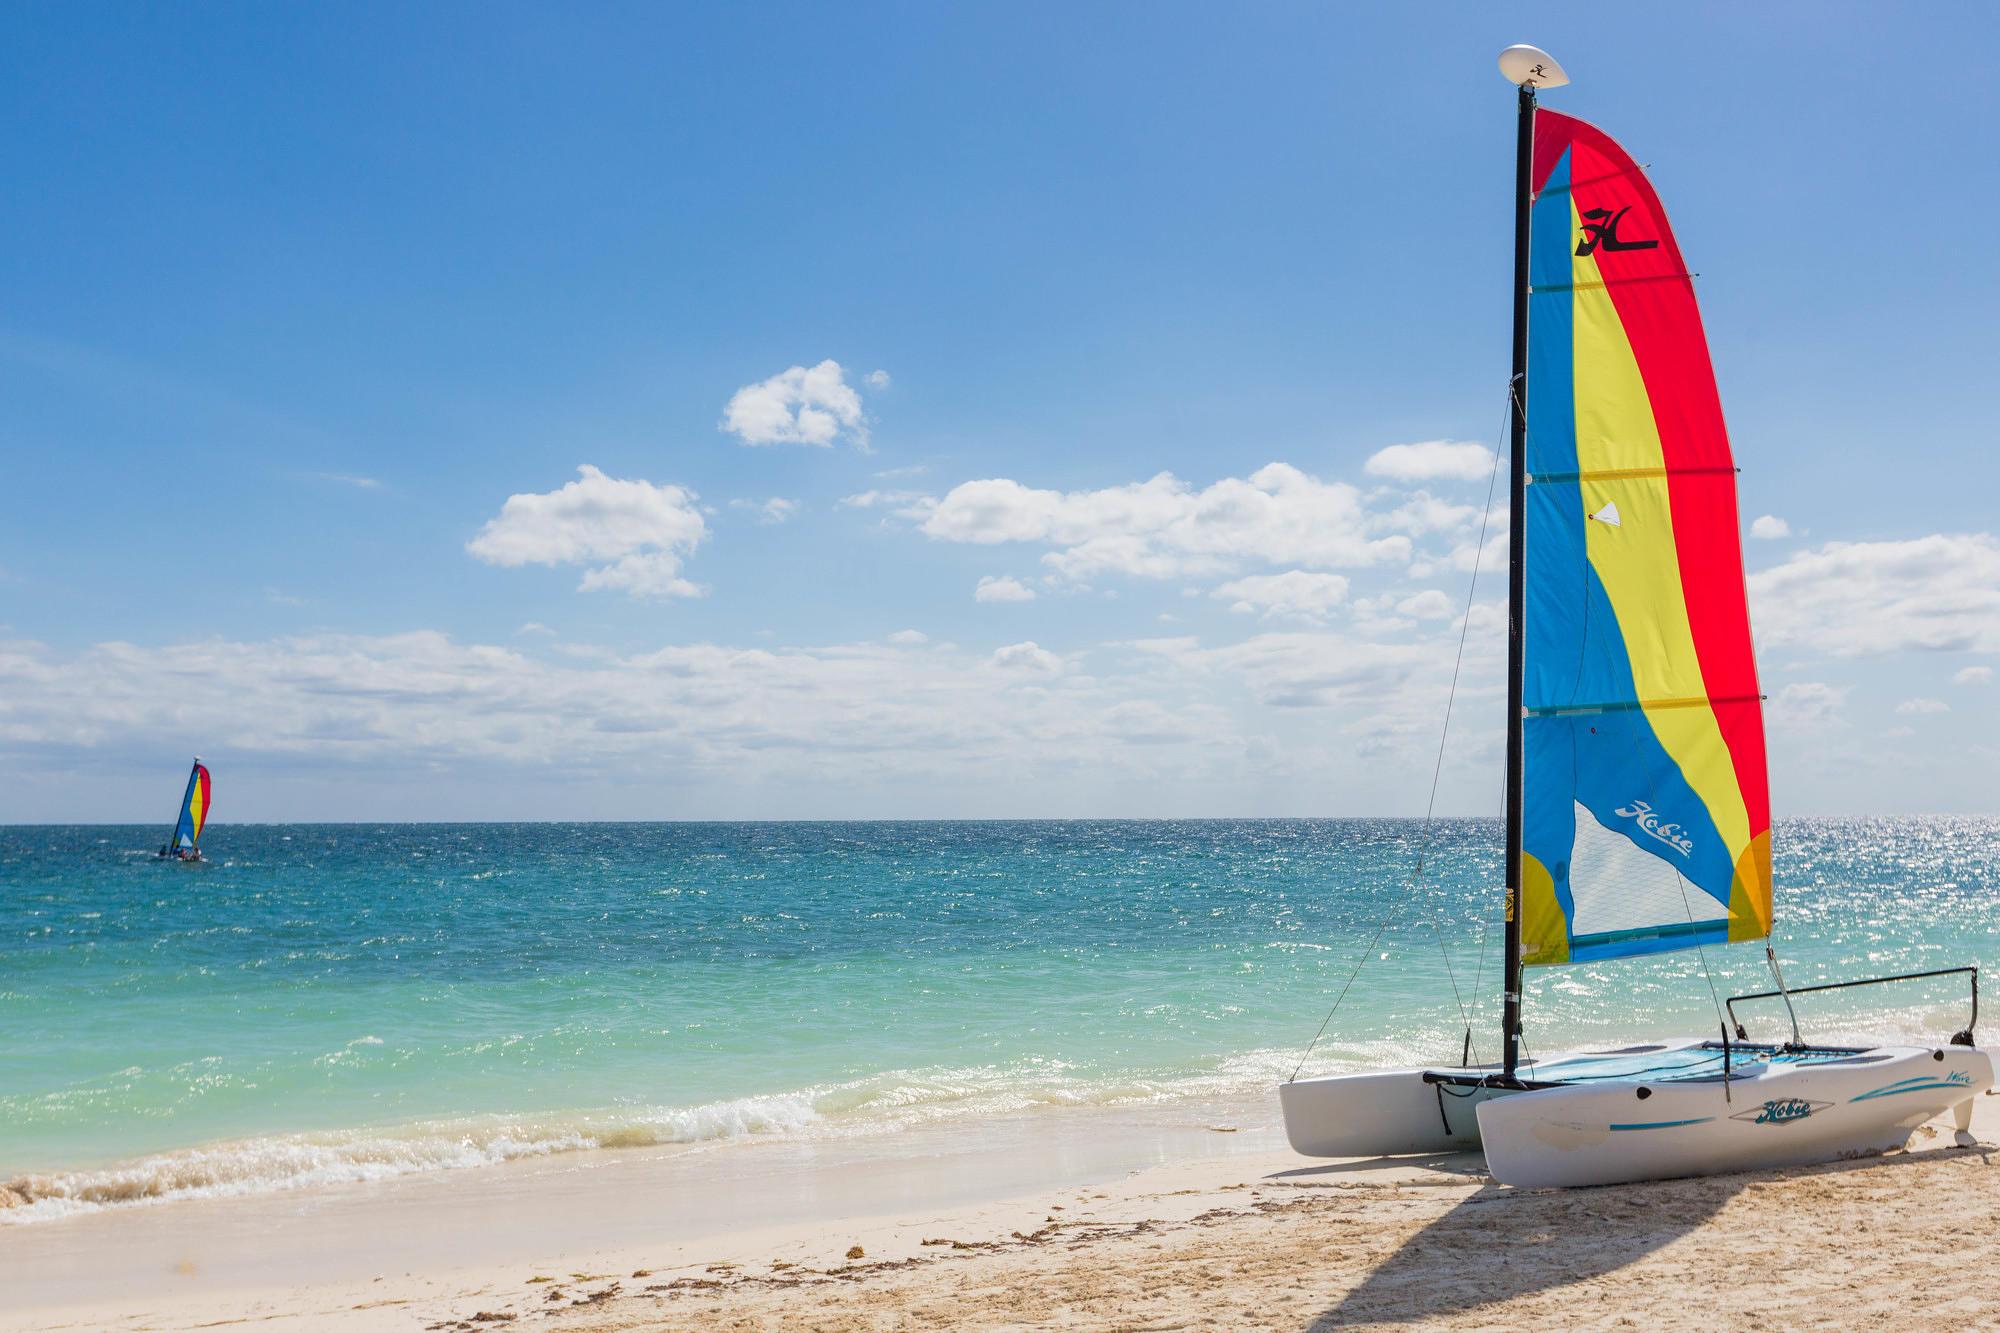 Beach at the Dreams Riviera Cancun Resort & Spa